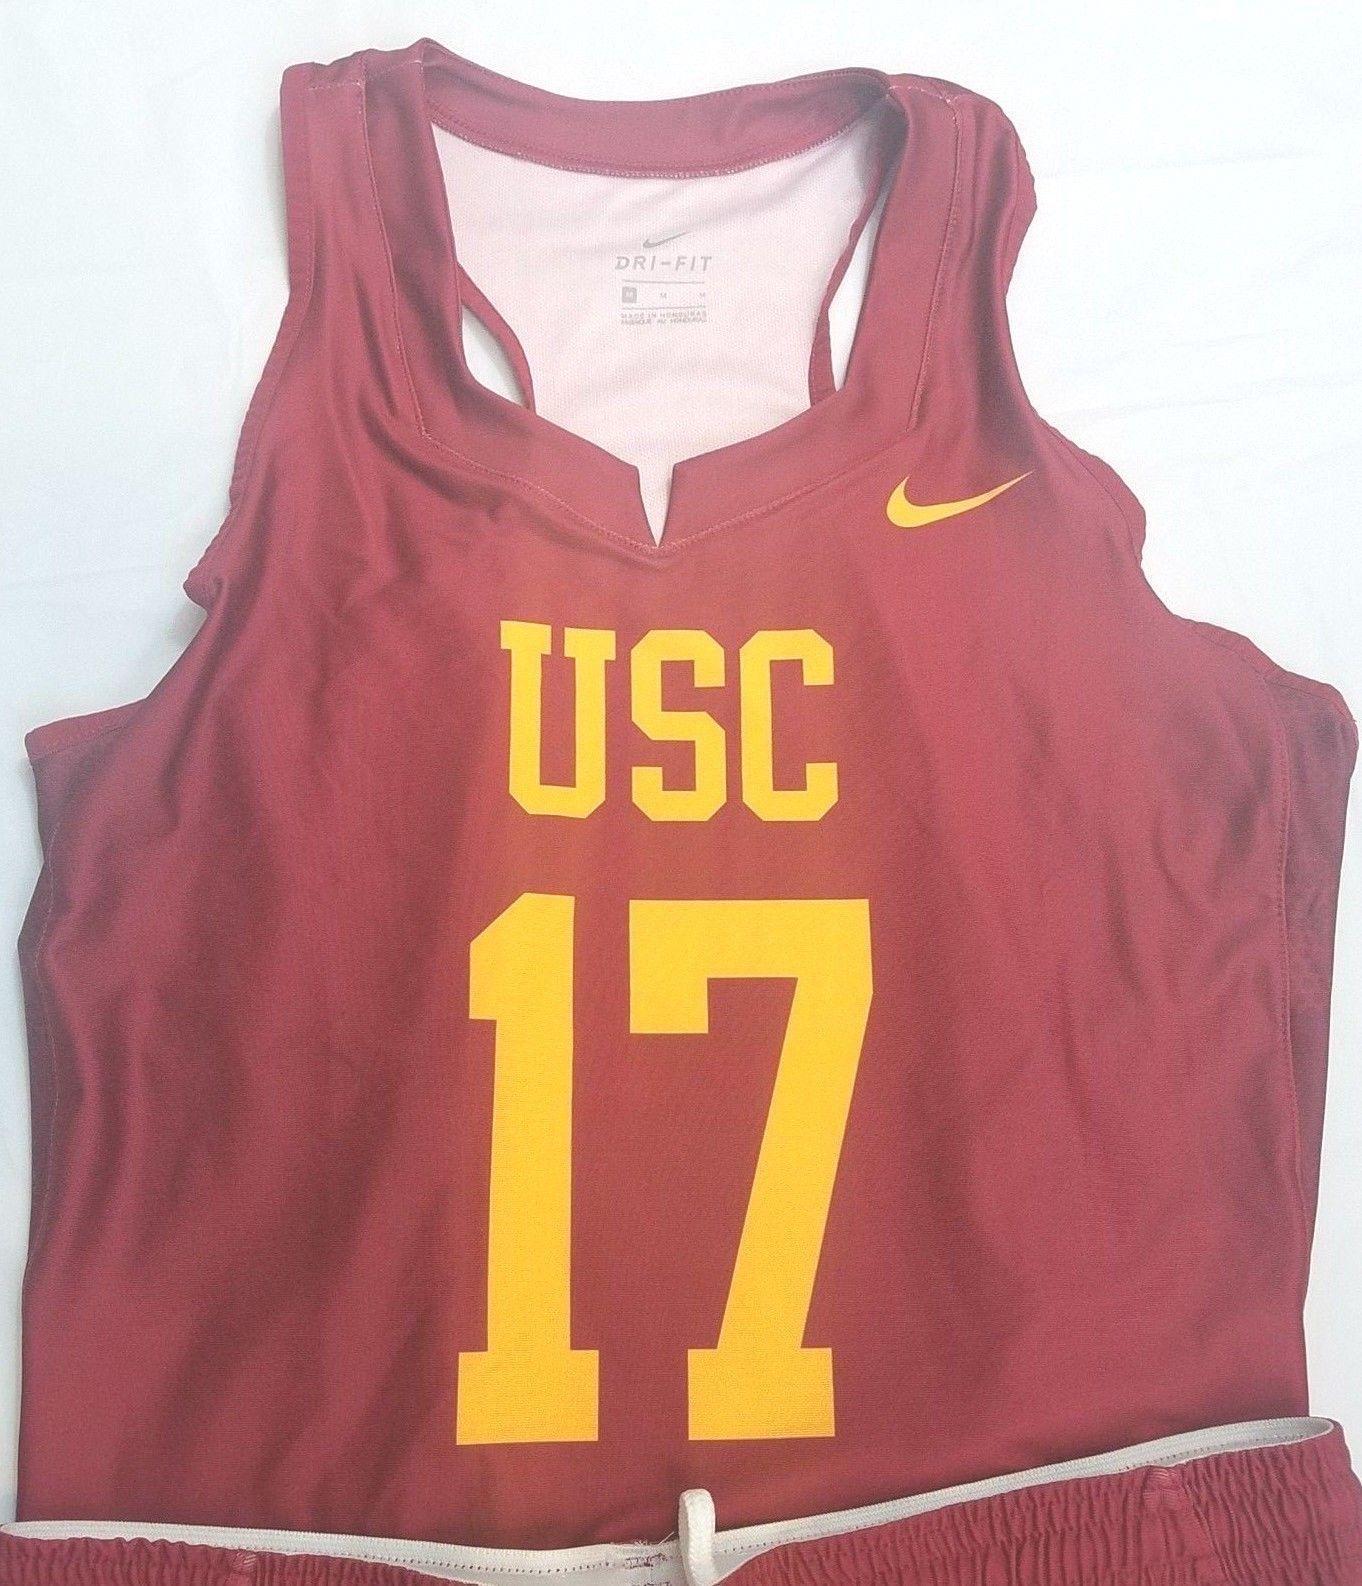 Nike USC Womens Lacrosse Team Uniform Skirt Jersey M Medium 2018